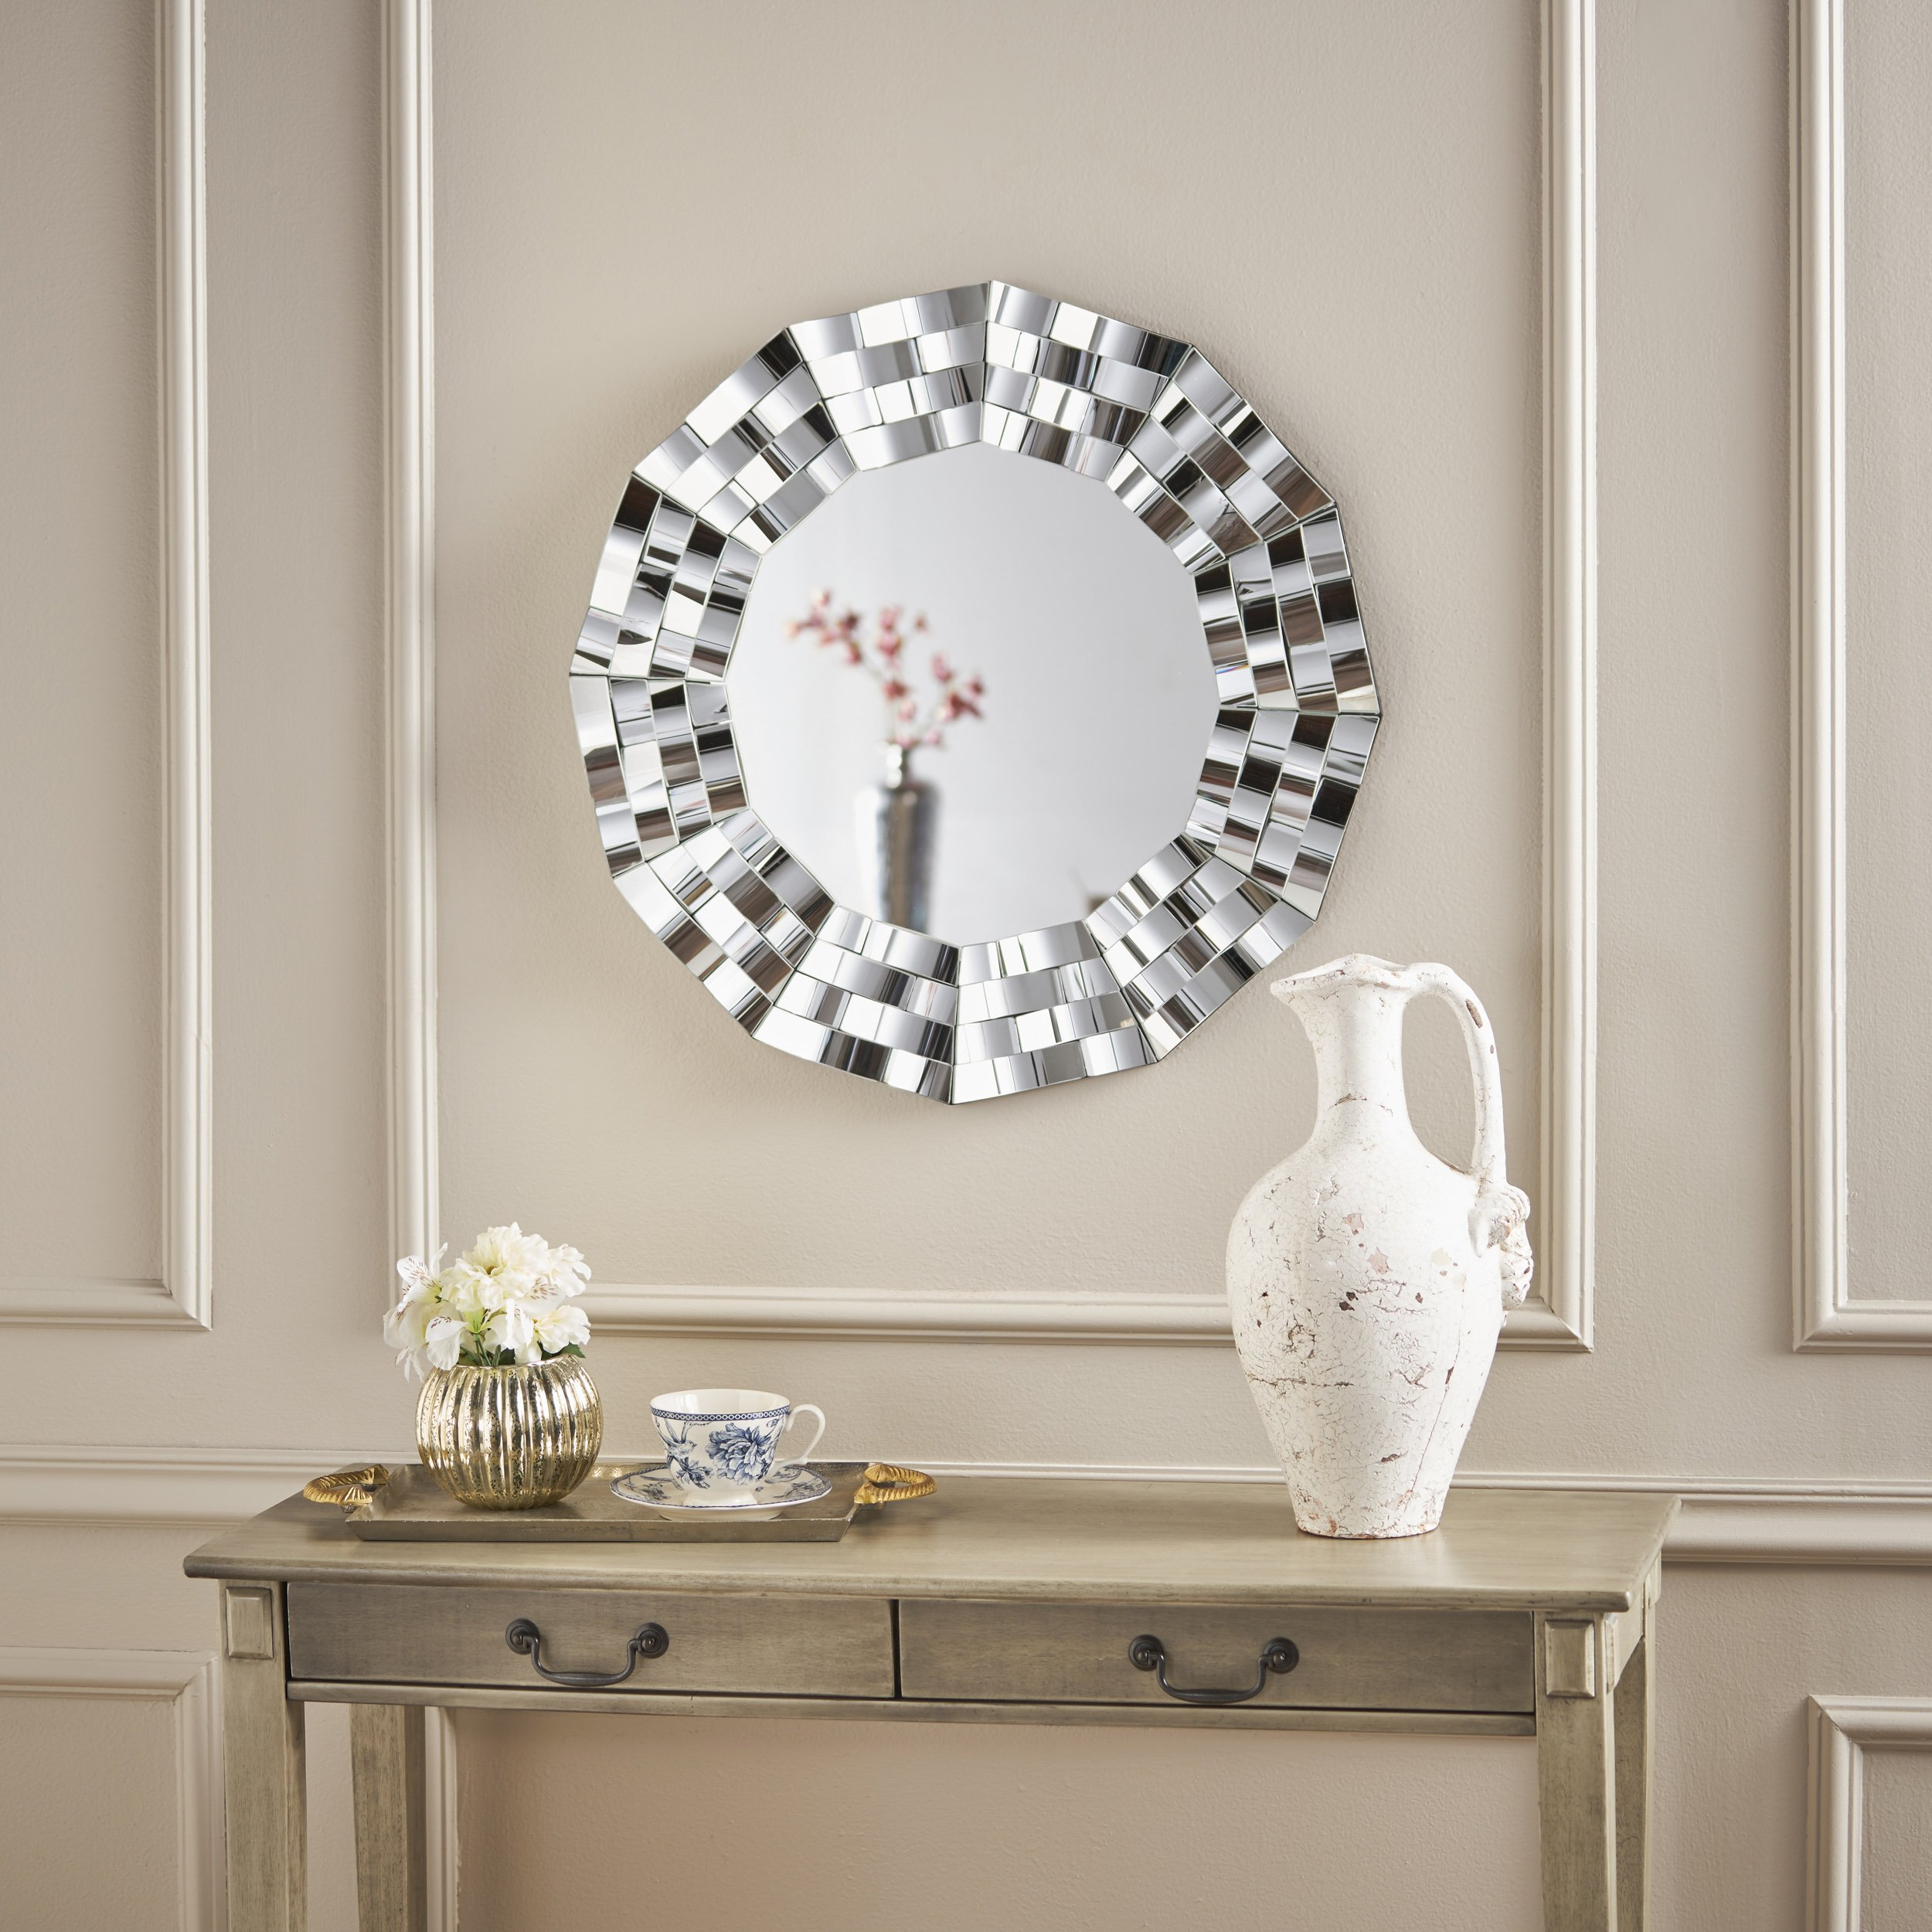 Christopher Knight Home 302084 Dalton Wall Mirror, Clear